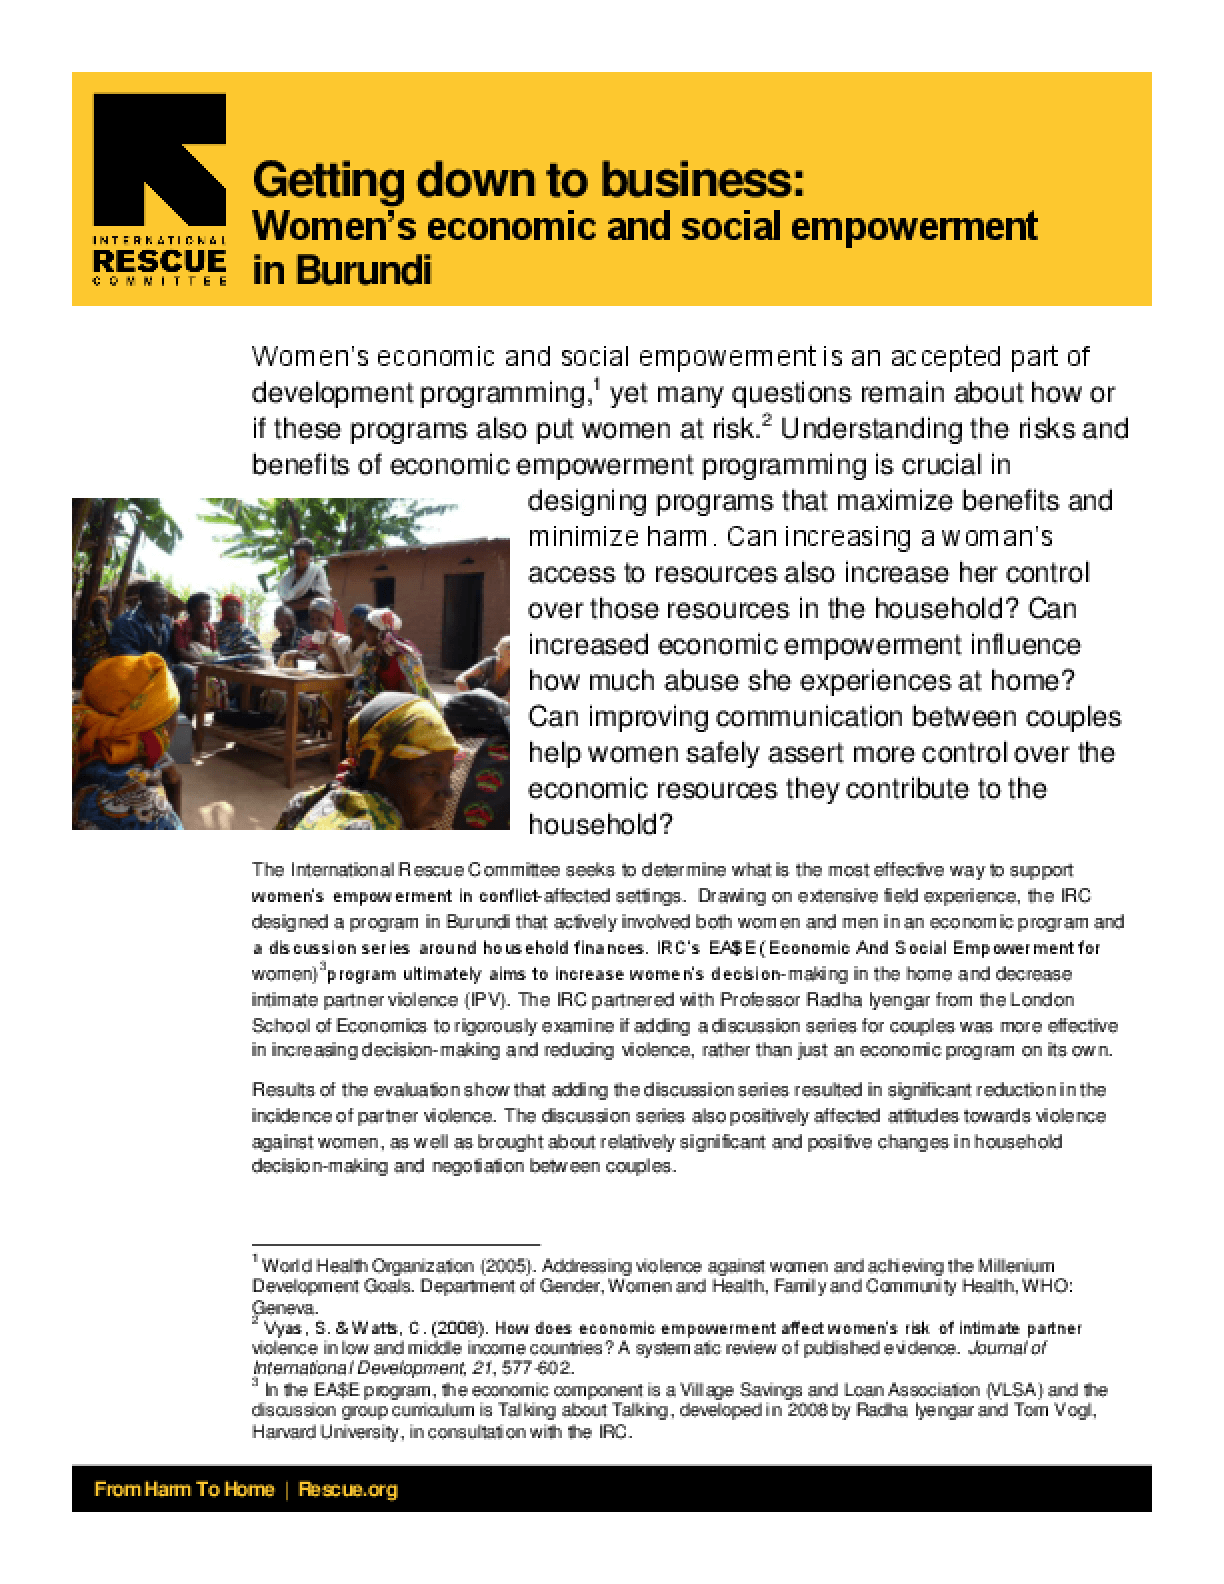 Getting Down to Business: Women's Economic and Social Empowerment in Burundi